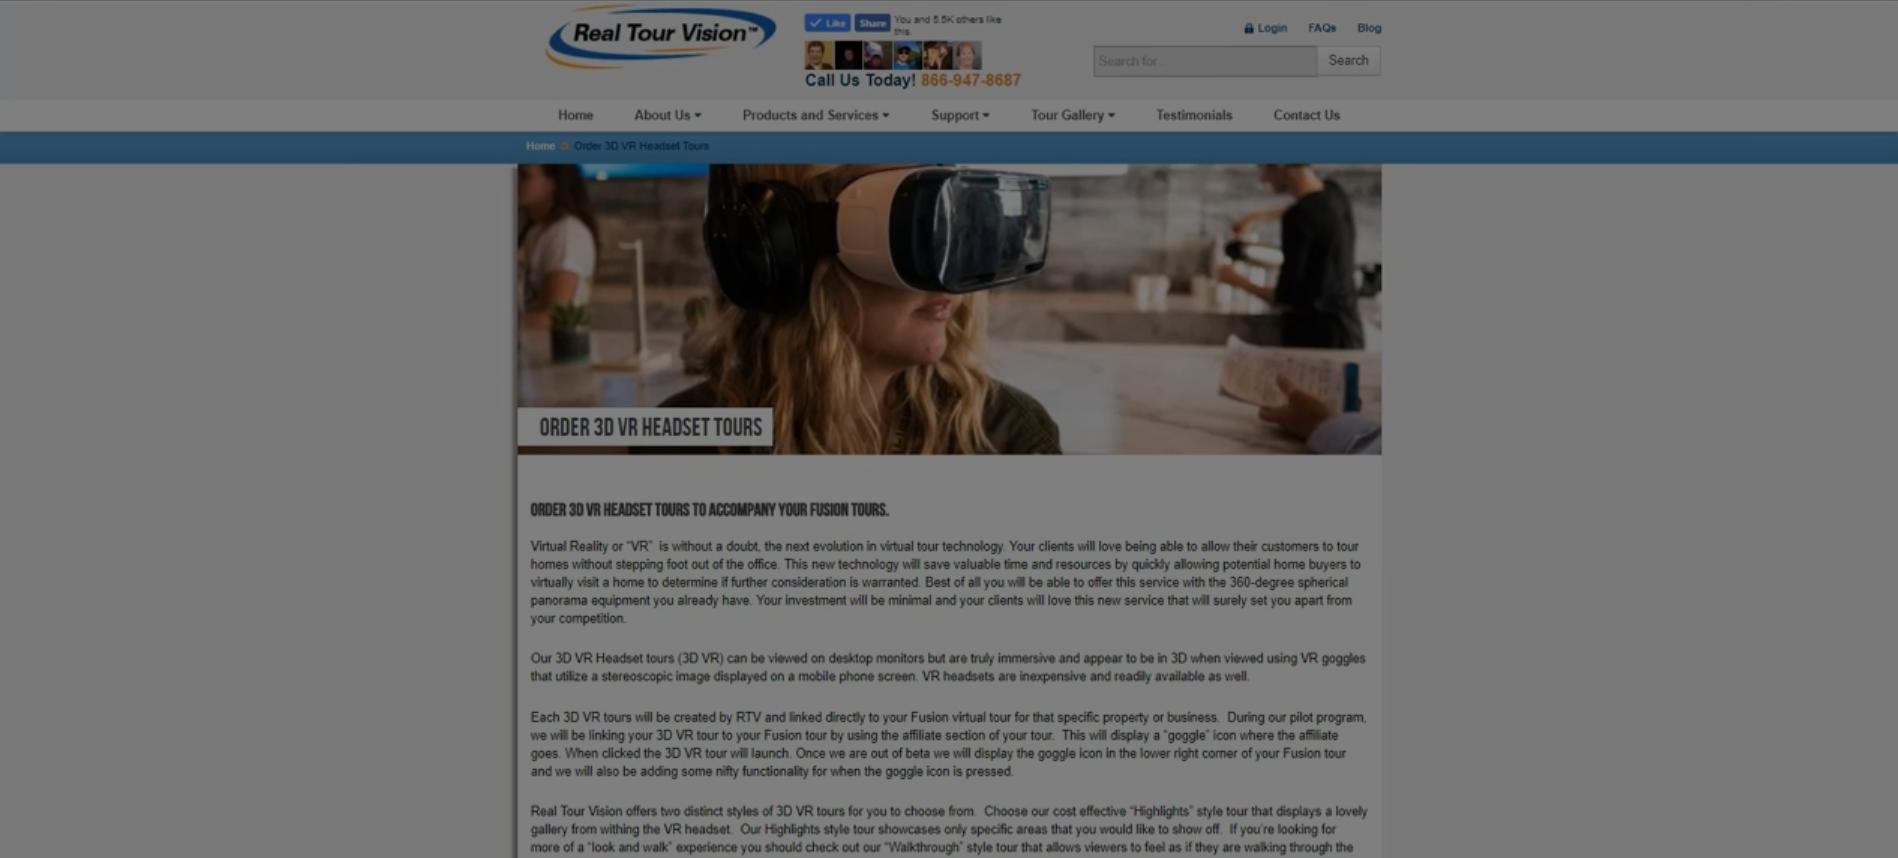 The FORMULA 80 – 3D VR headset webinar